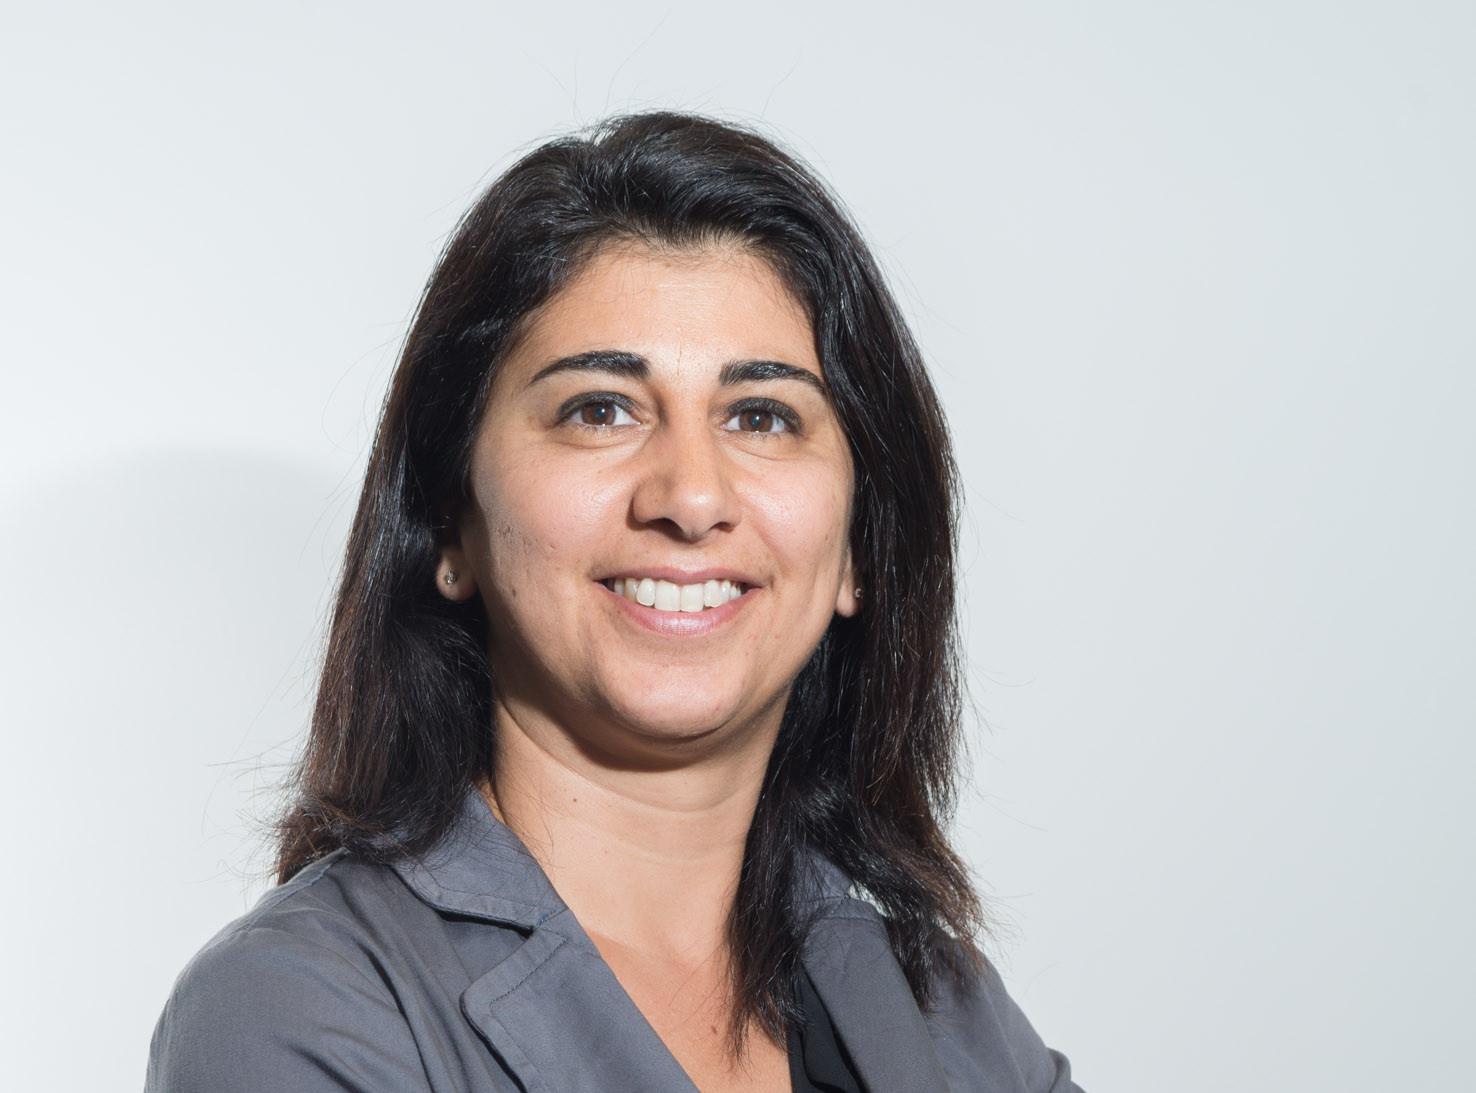 Daniela D'Andrea